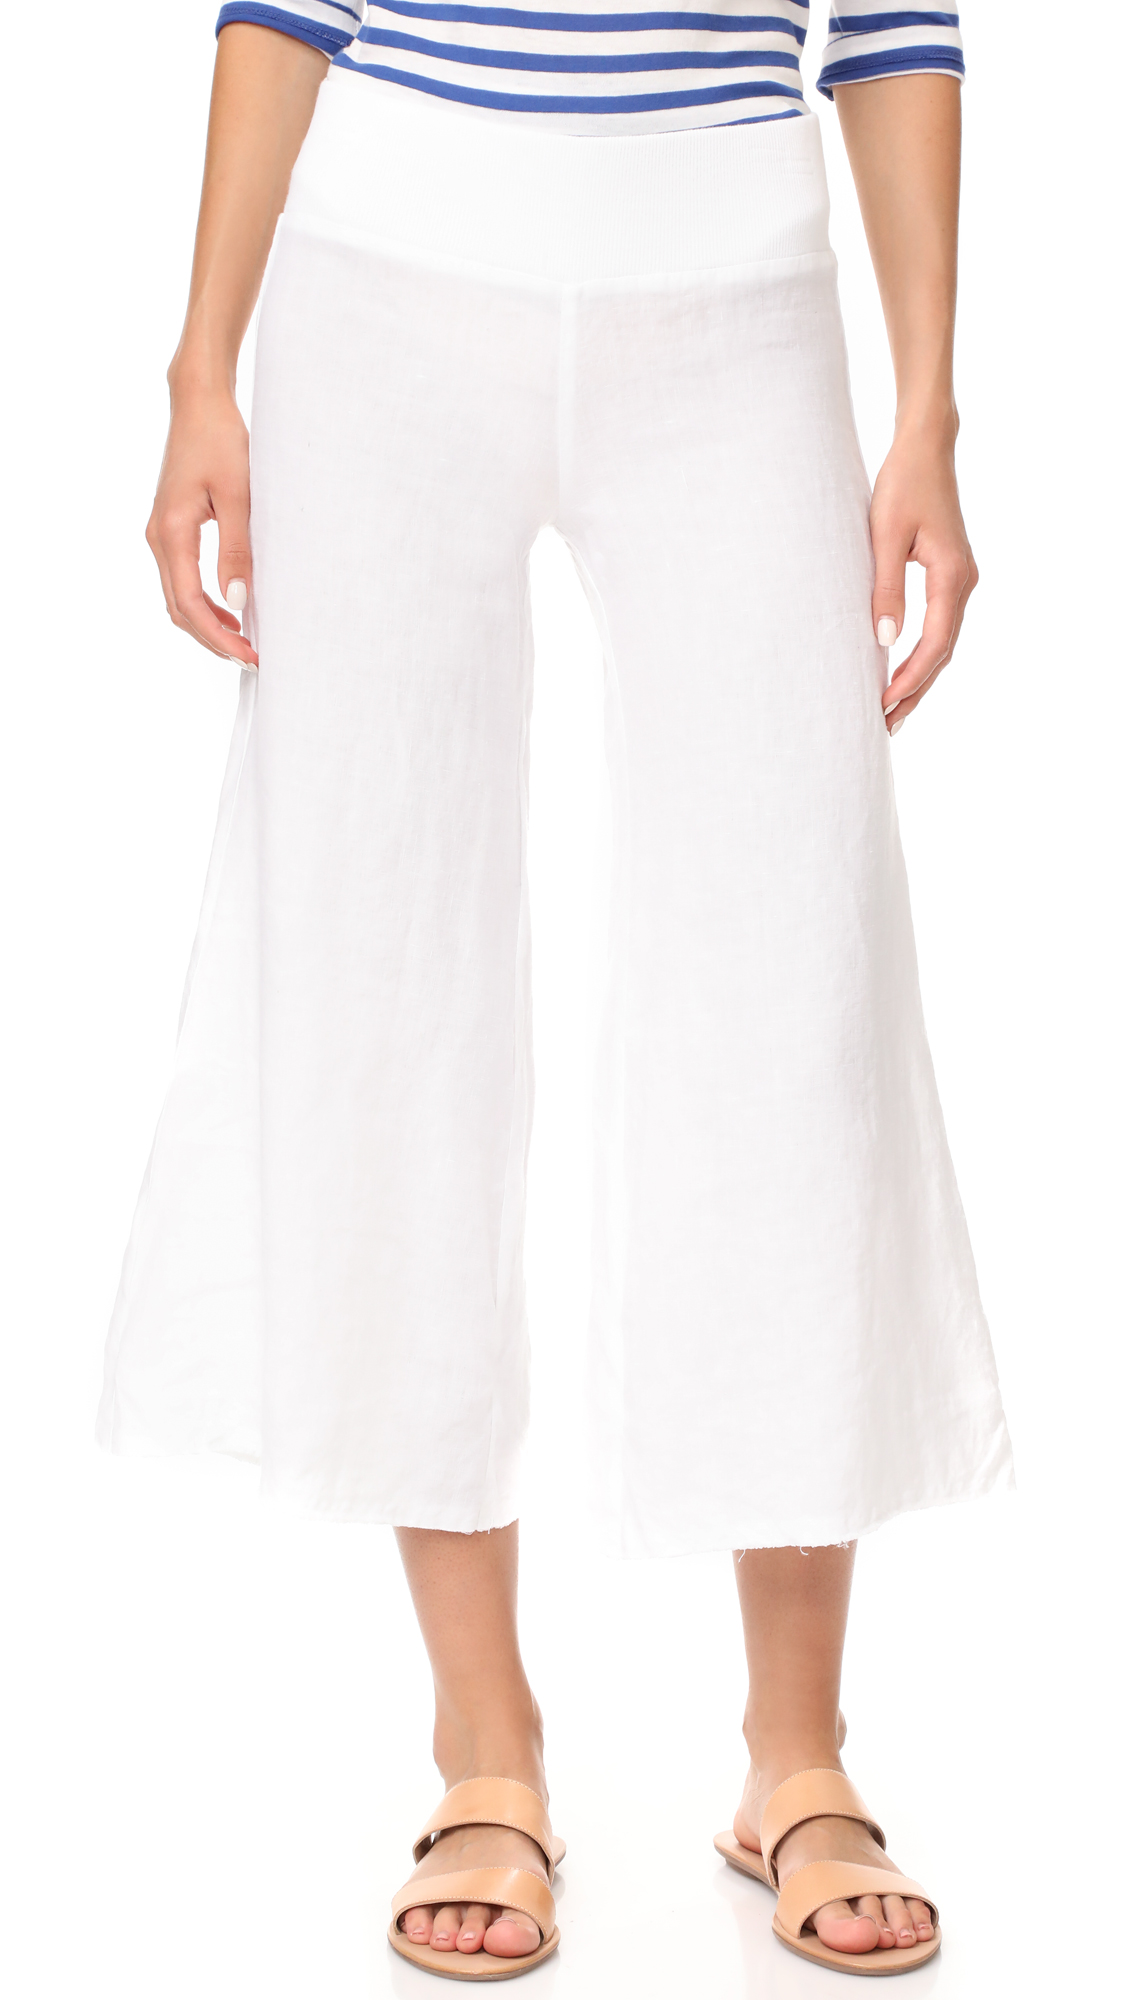 Enza Costa Cropped Wide Leg Linen Pants - White